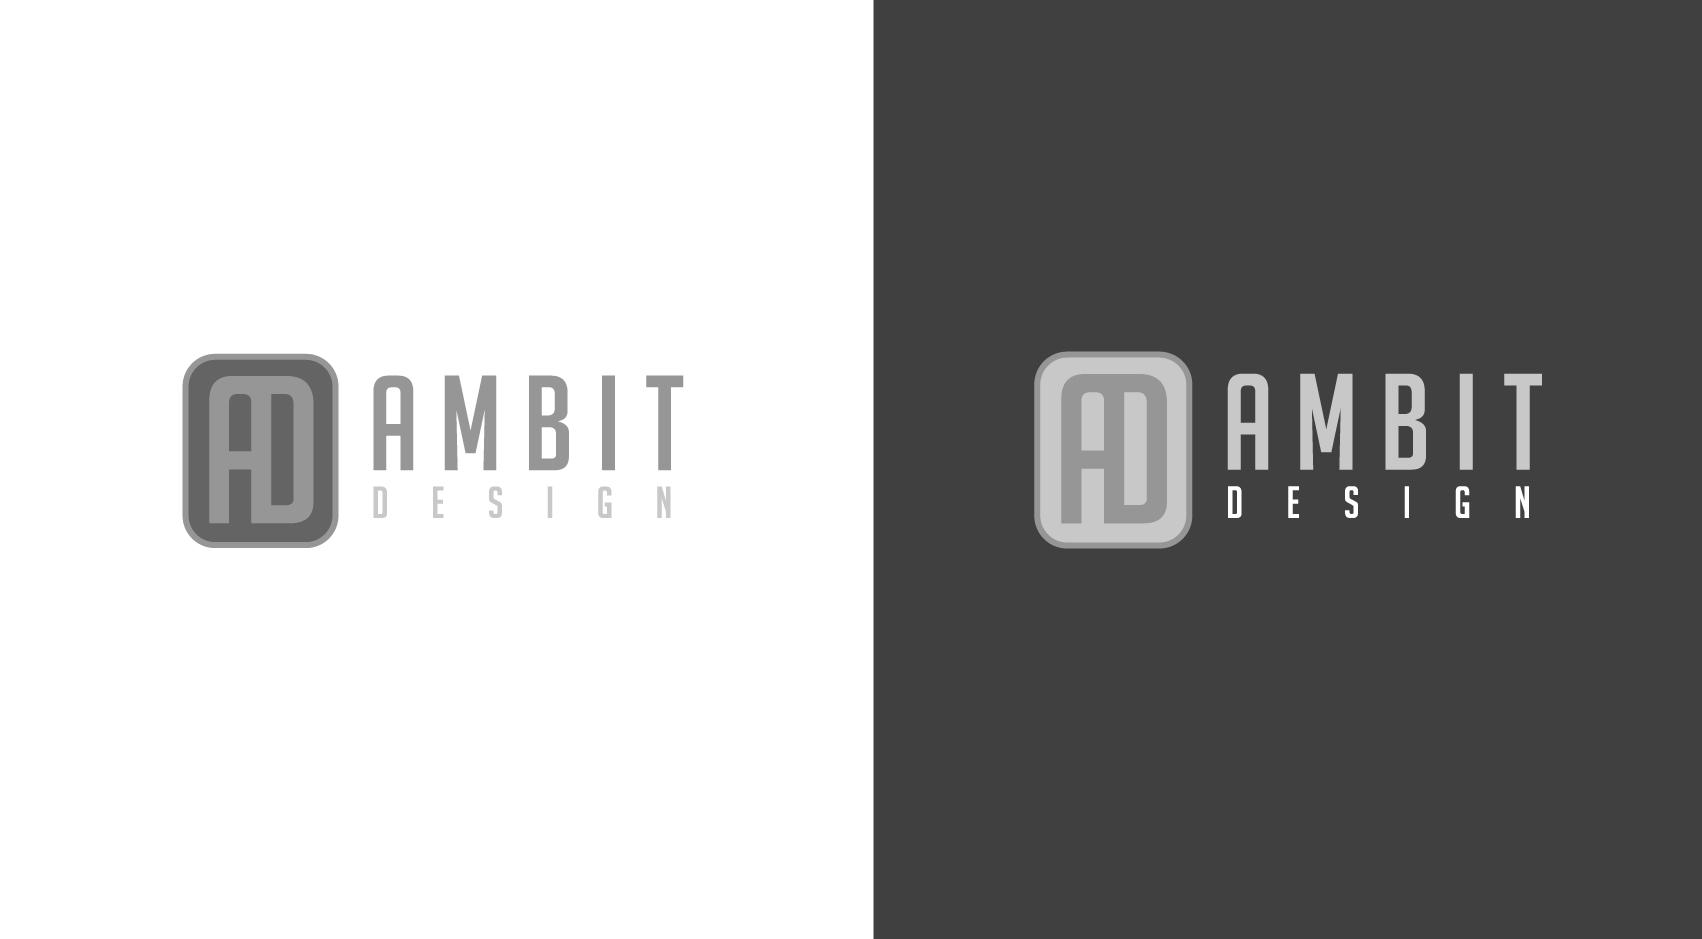 ambit-redesign-logo.jpg